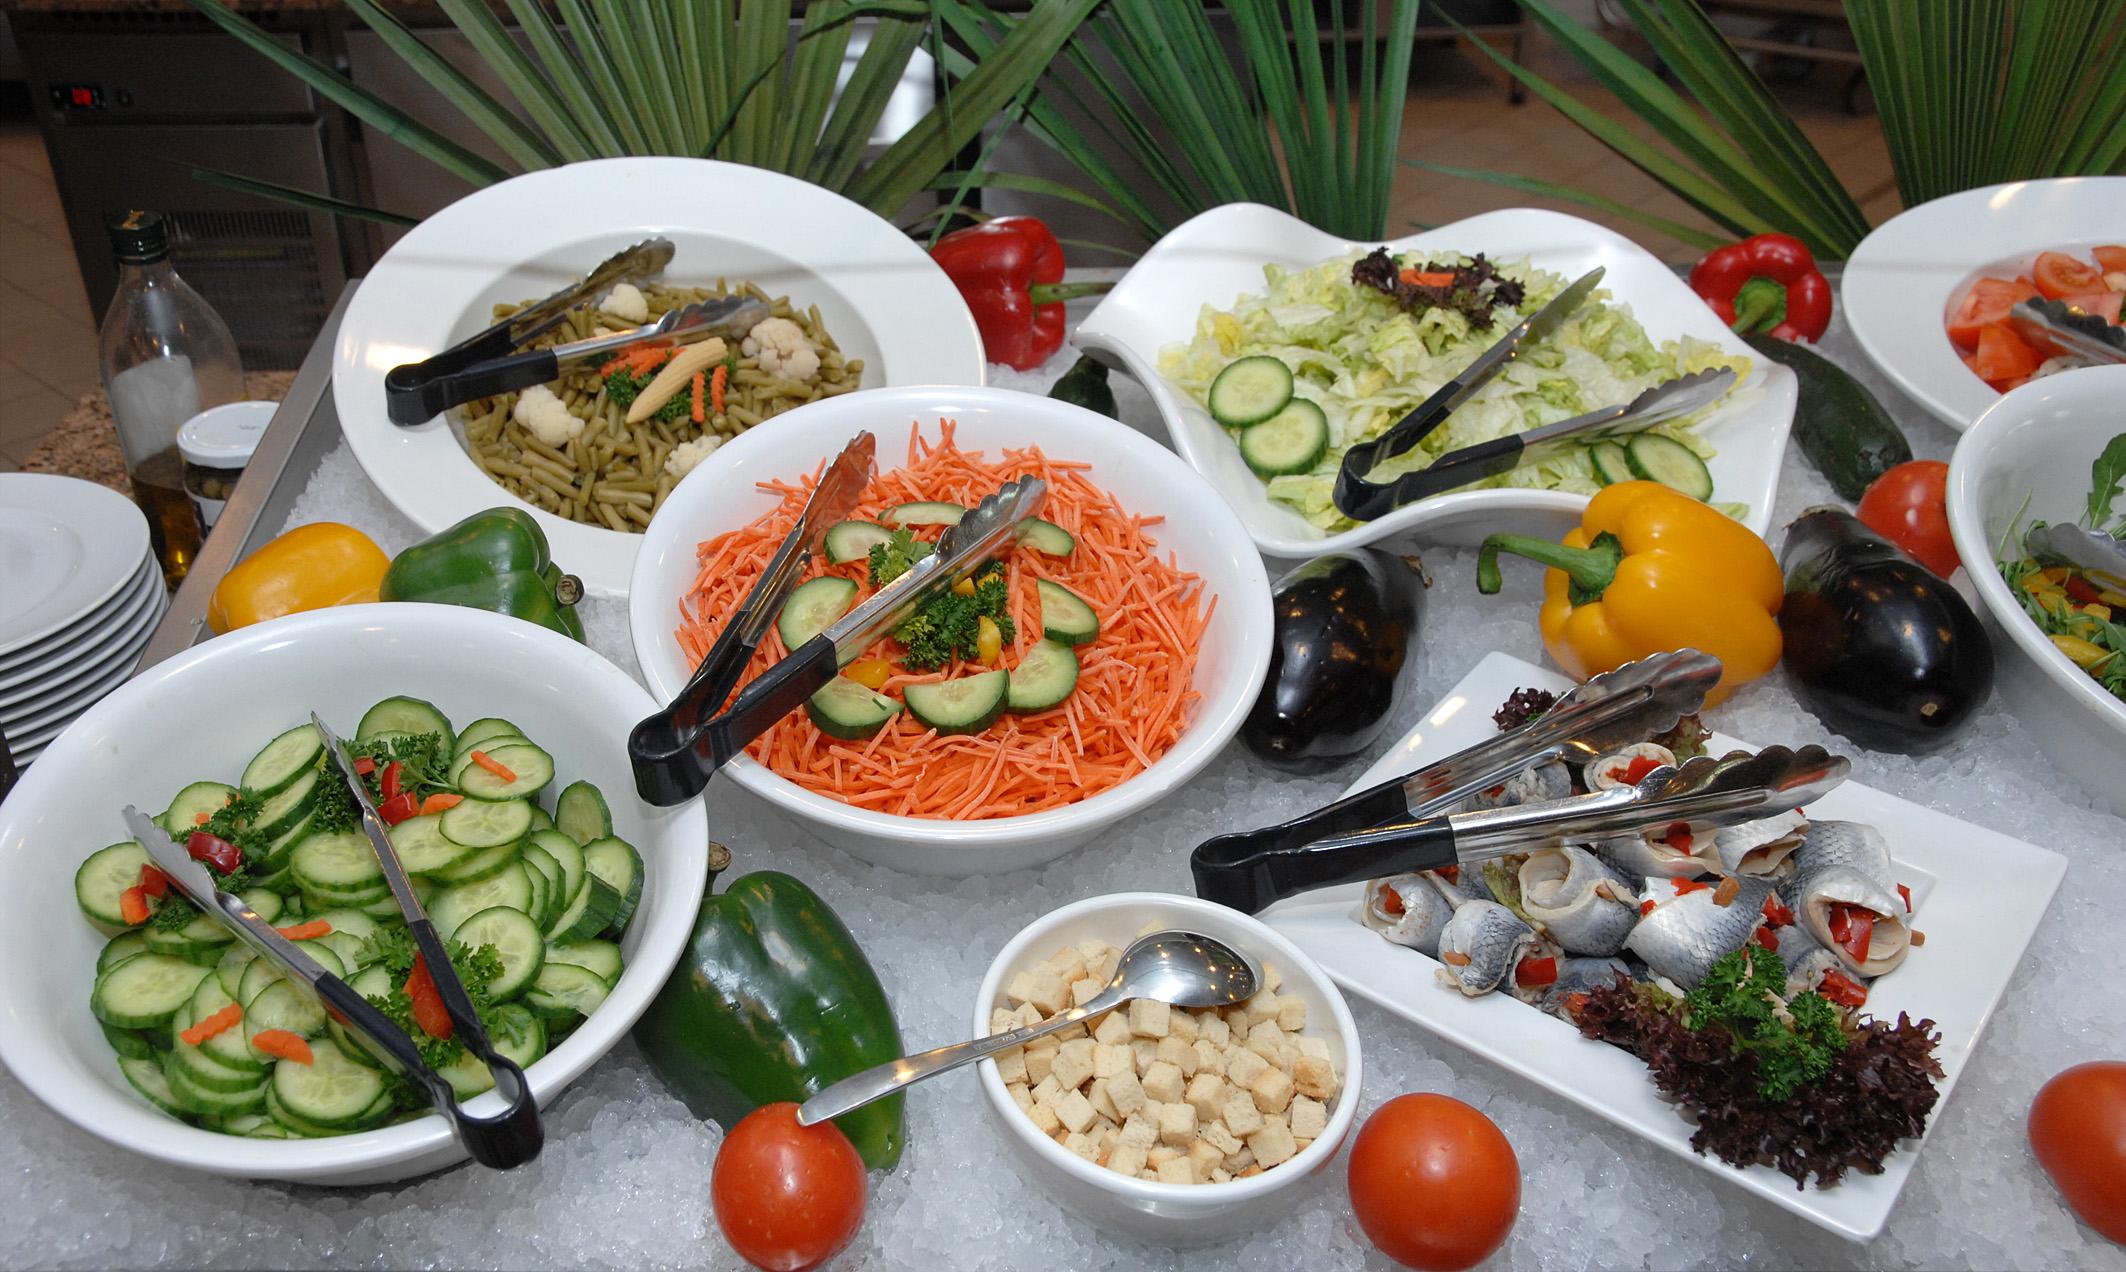 Foto: Salatbuffet